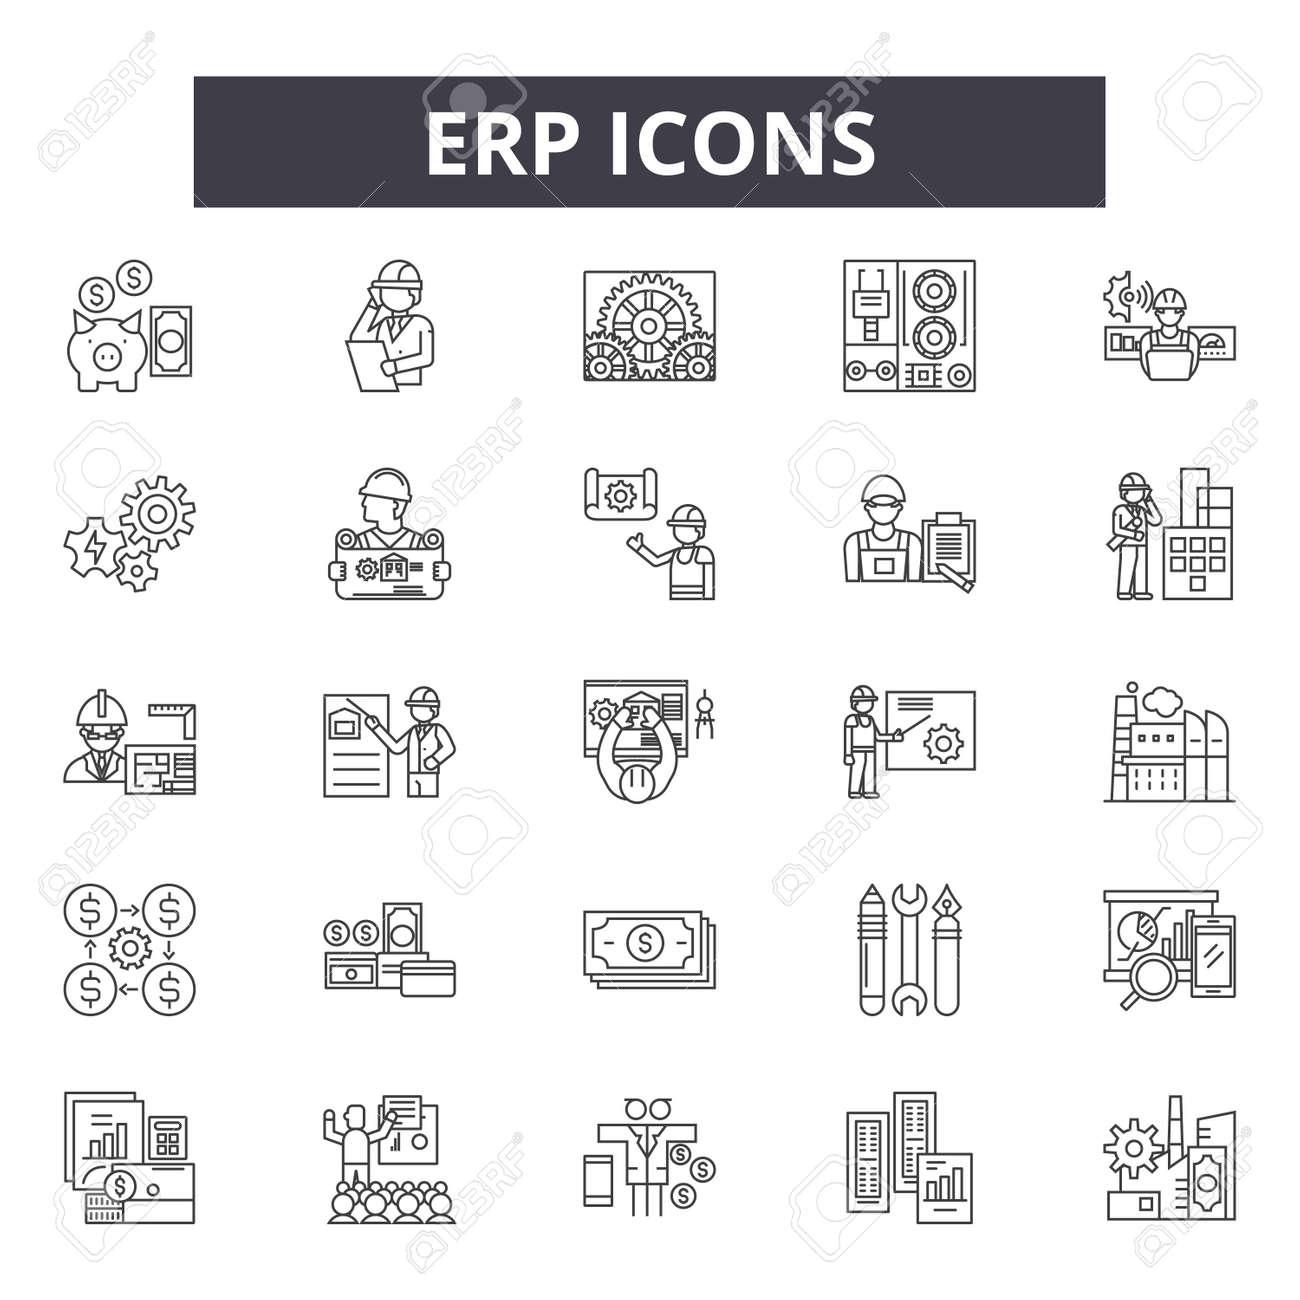 Erp line icons, signs set, vector. Erp outline concept illustration: business,erp,data,service,success,software,sales,information - 123582004